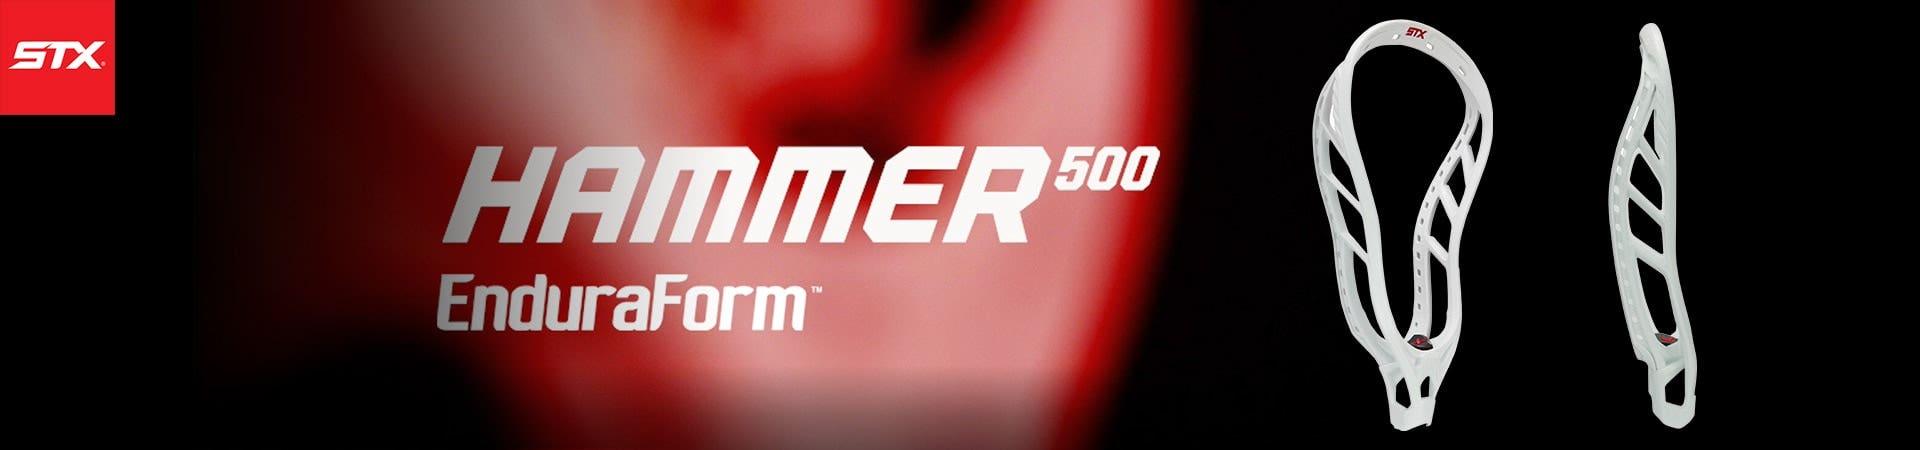 STX Hammer 500 Enduraform Lacrosse Head